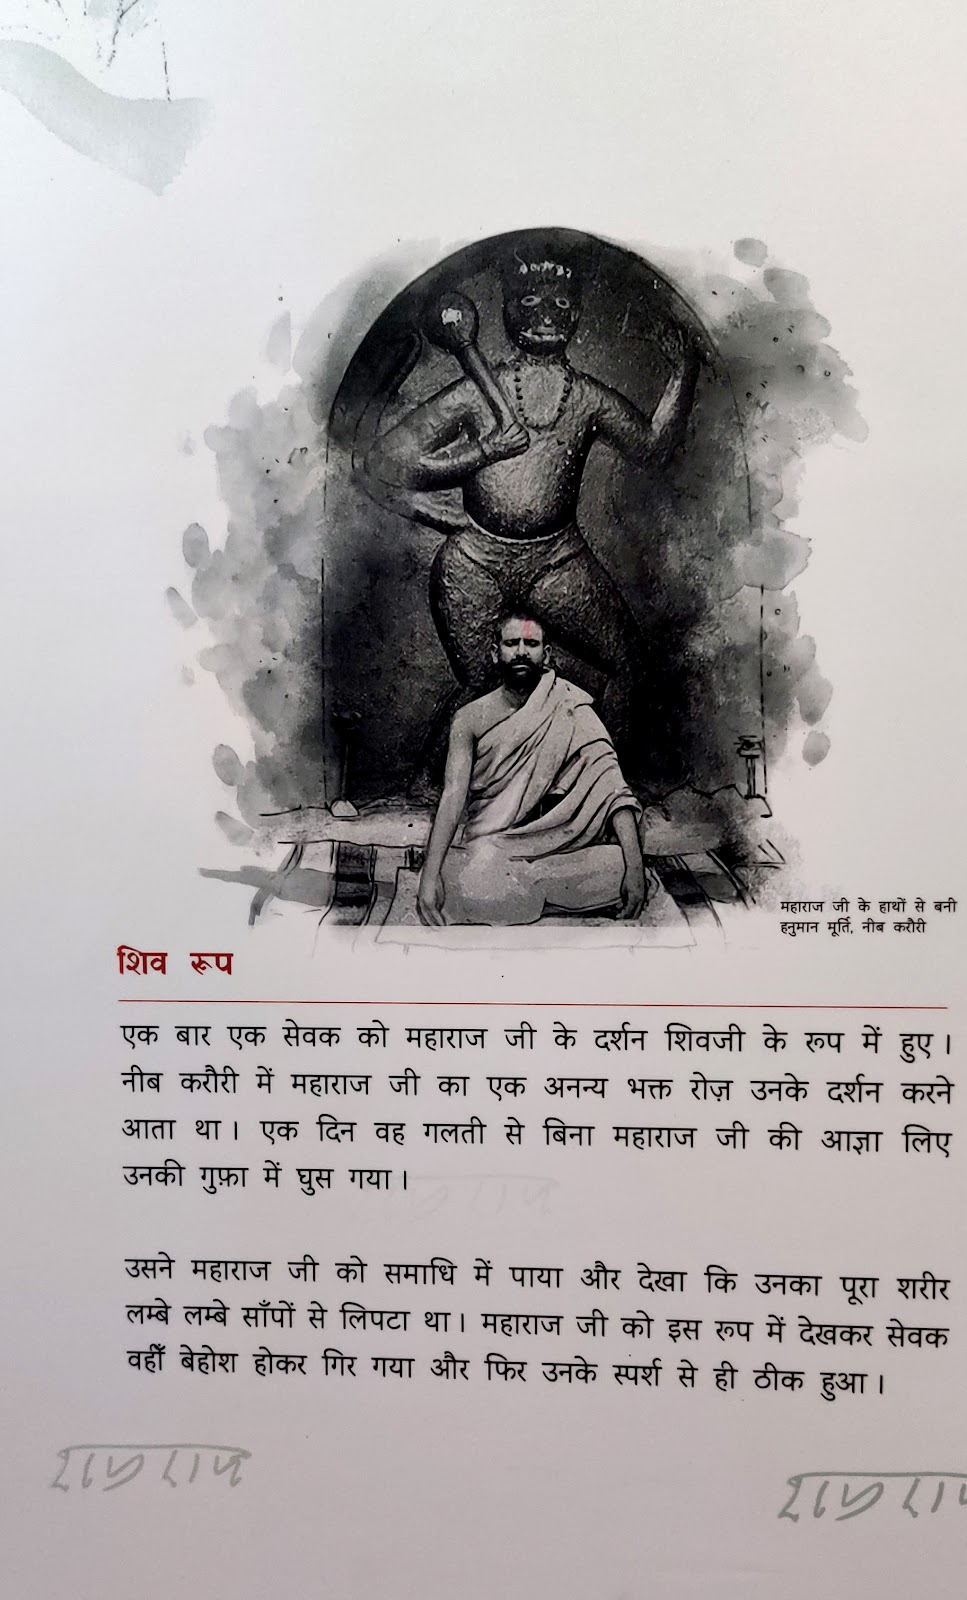 अनमोल संग्रह बाबा नीब करोरी समाधी मंदिर, वृन्दावन